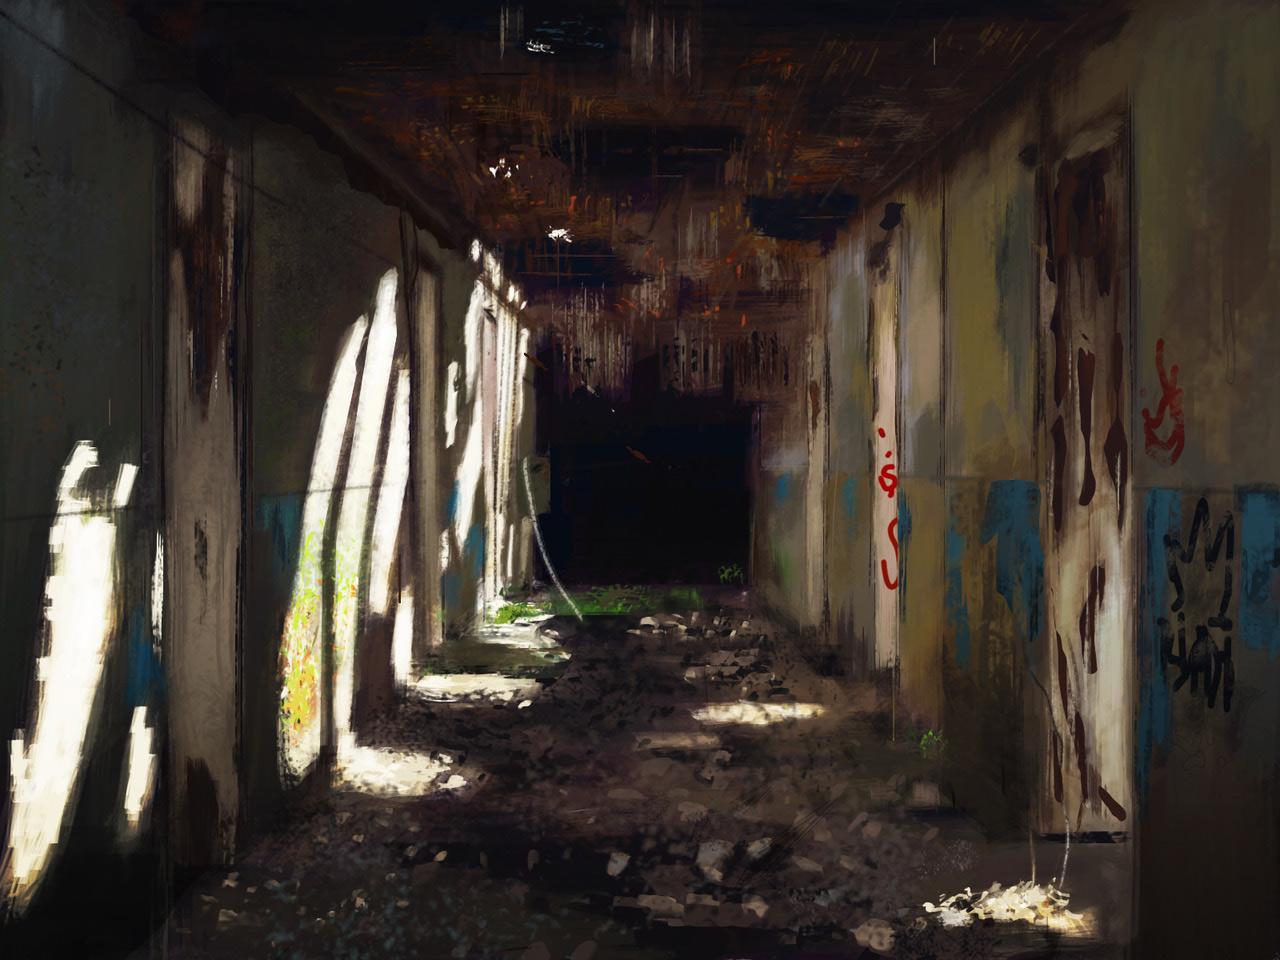 ashcan-digital-course-foundation-digital-painting-works-20-2018-11.jpg